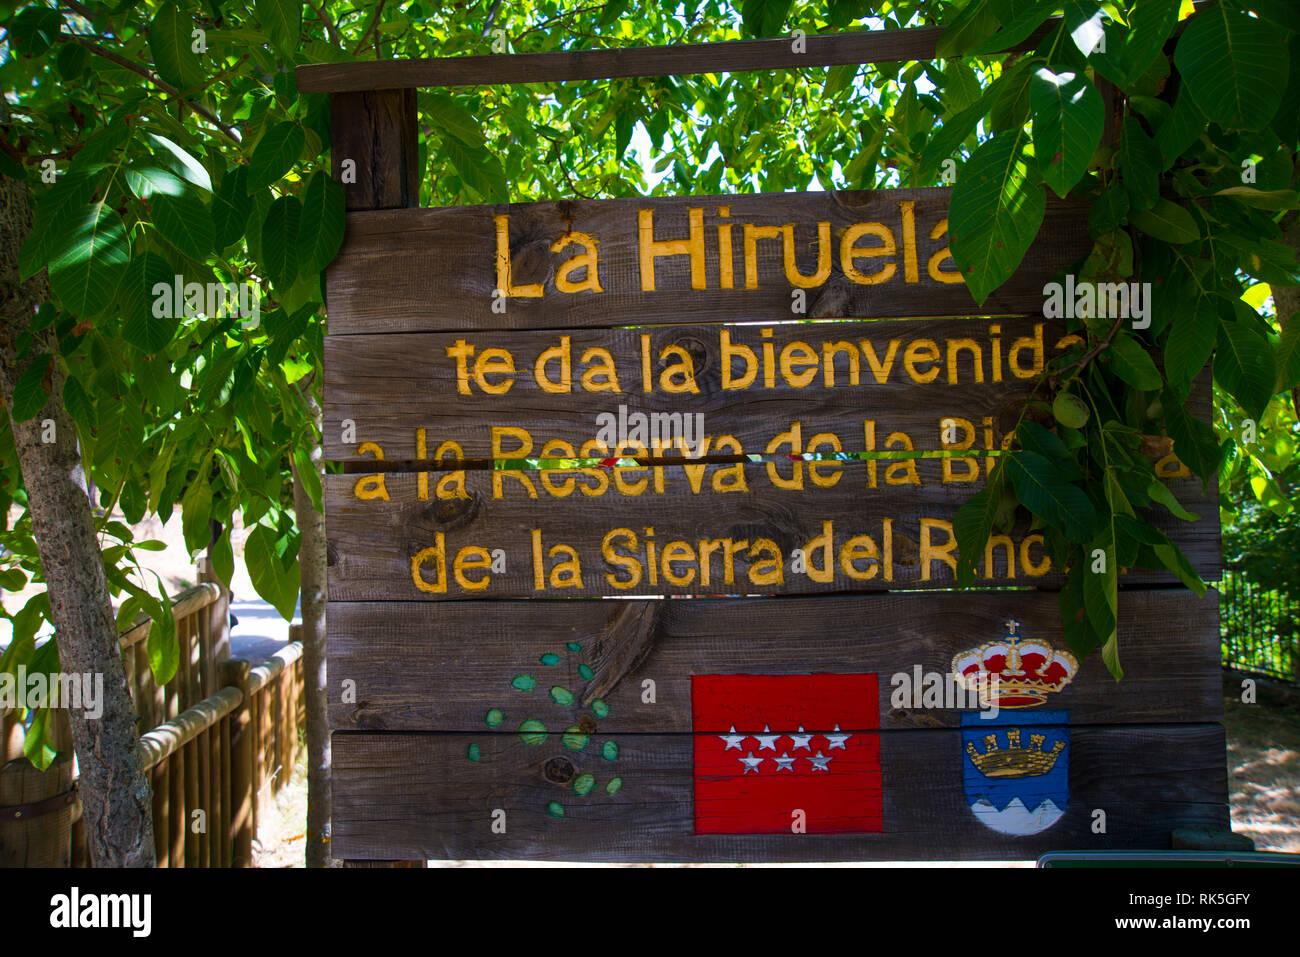 Signe de bienvenue. La Hiruela, province de Madrid, Espagne. Photo Stock